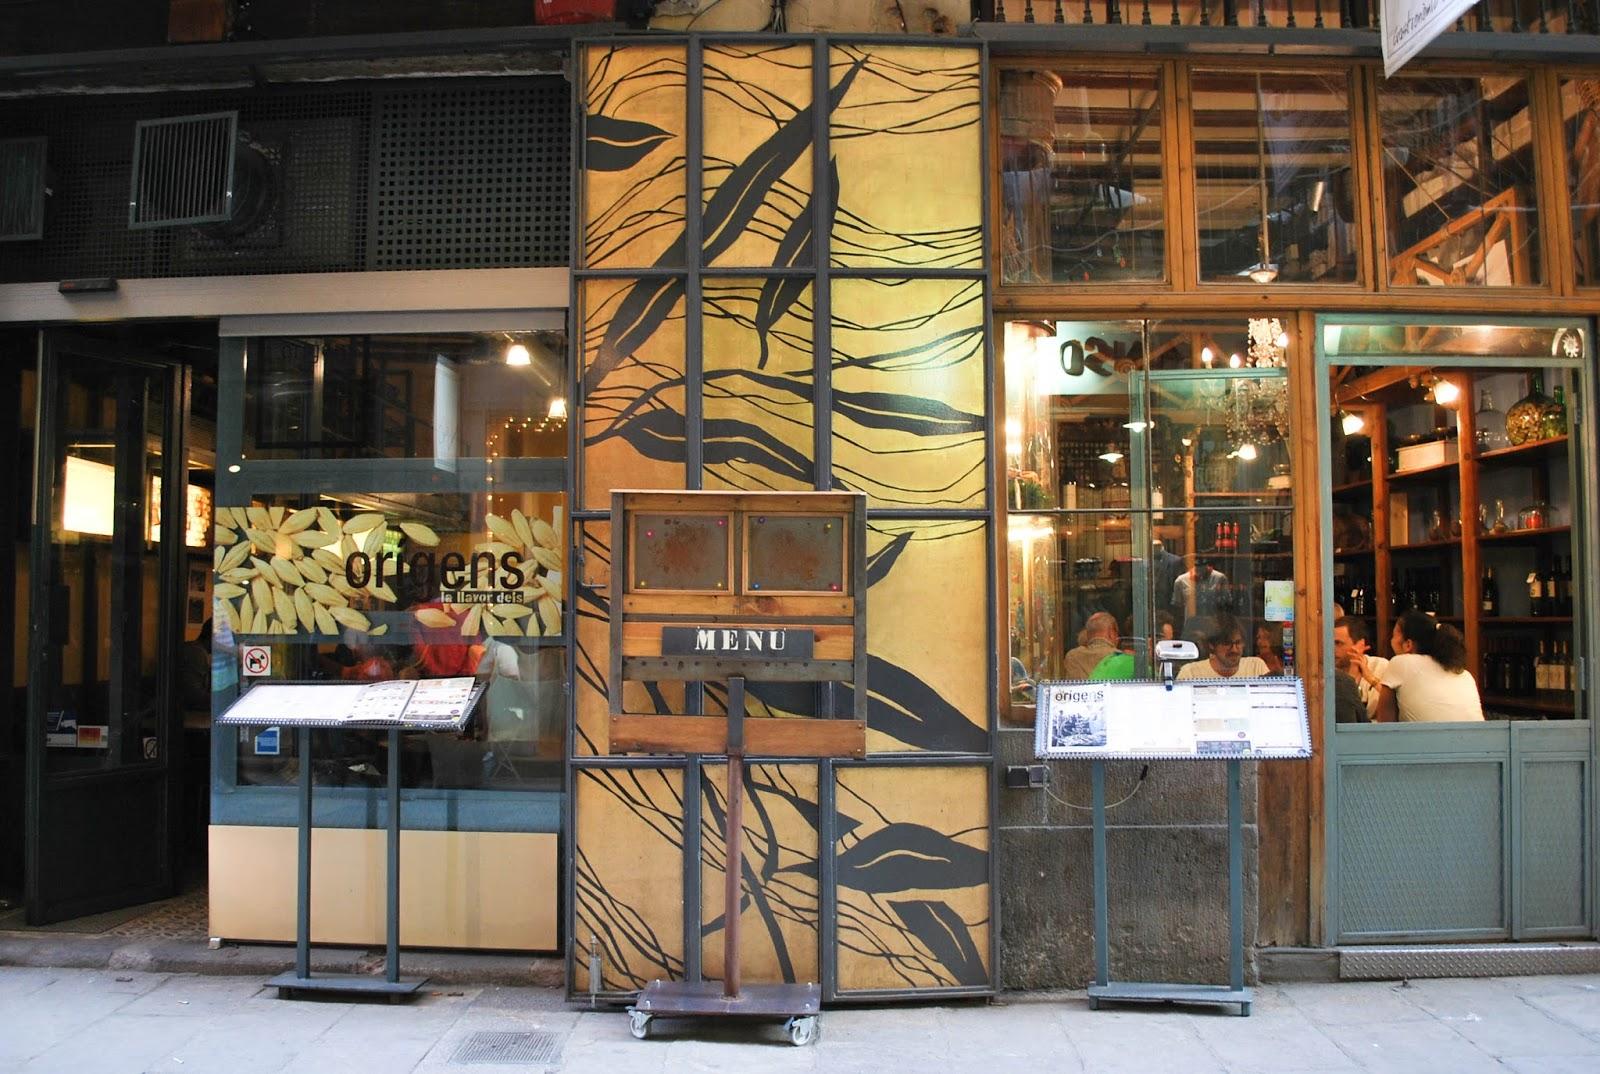 http://www.hommum.com/2014/06/el-born-que-ver-y-donde-comer.html #barcelona #bestplacesofbarcelona